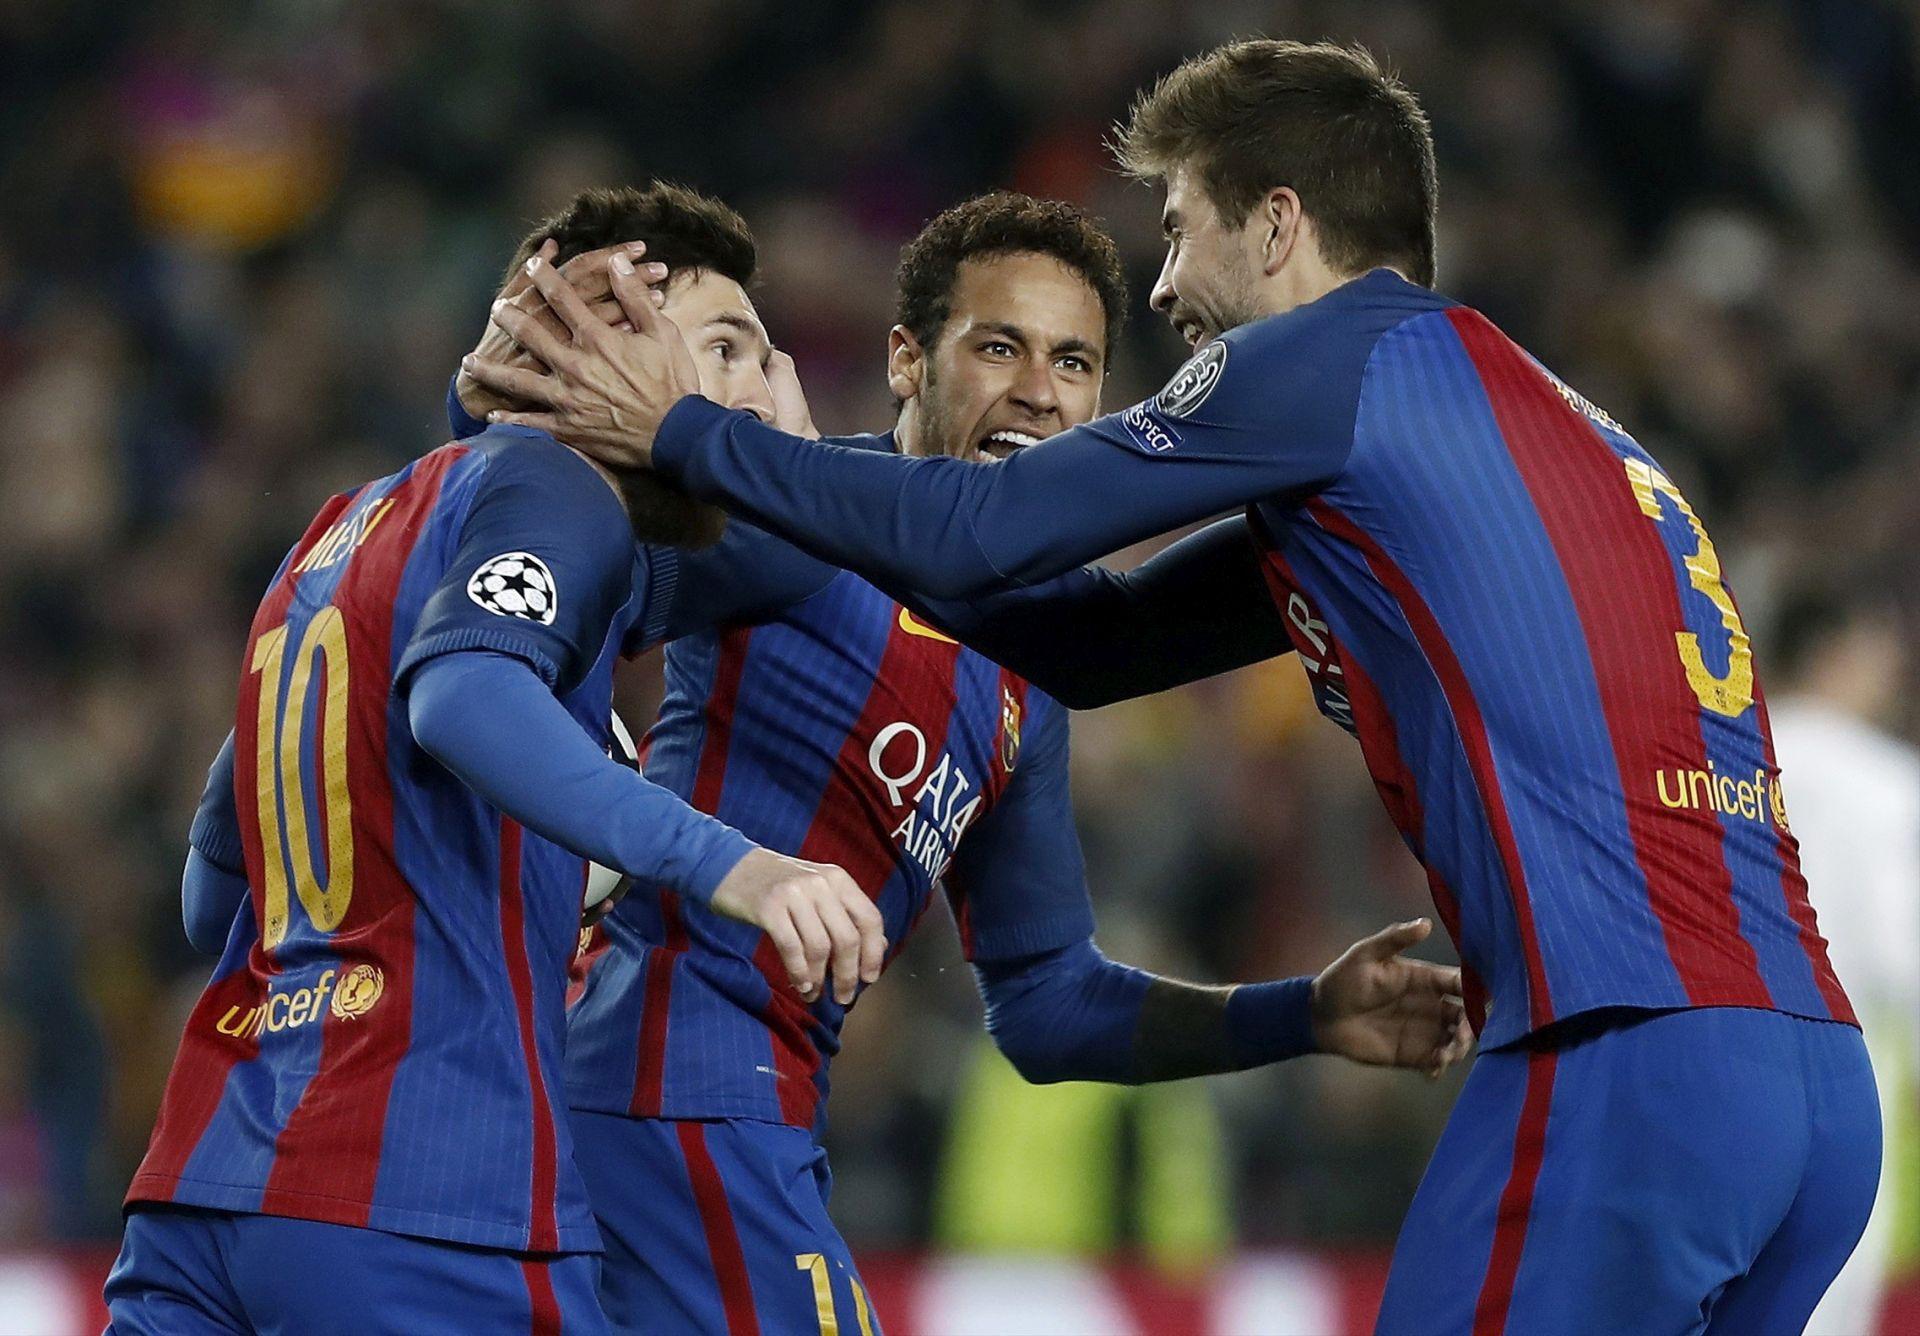 LIGA PRVAKA: Čudesna Barcelona izborila četvrtfinale